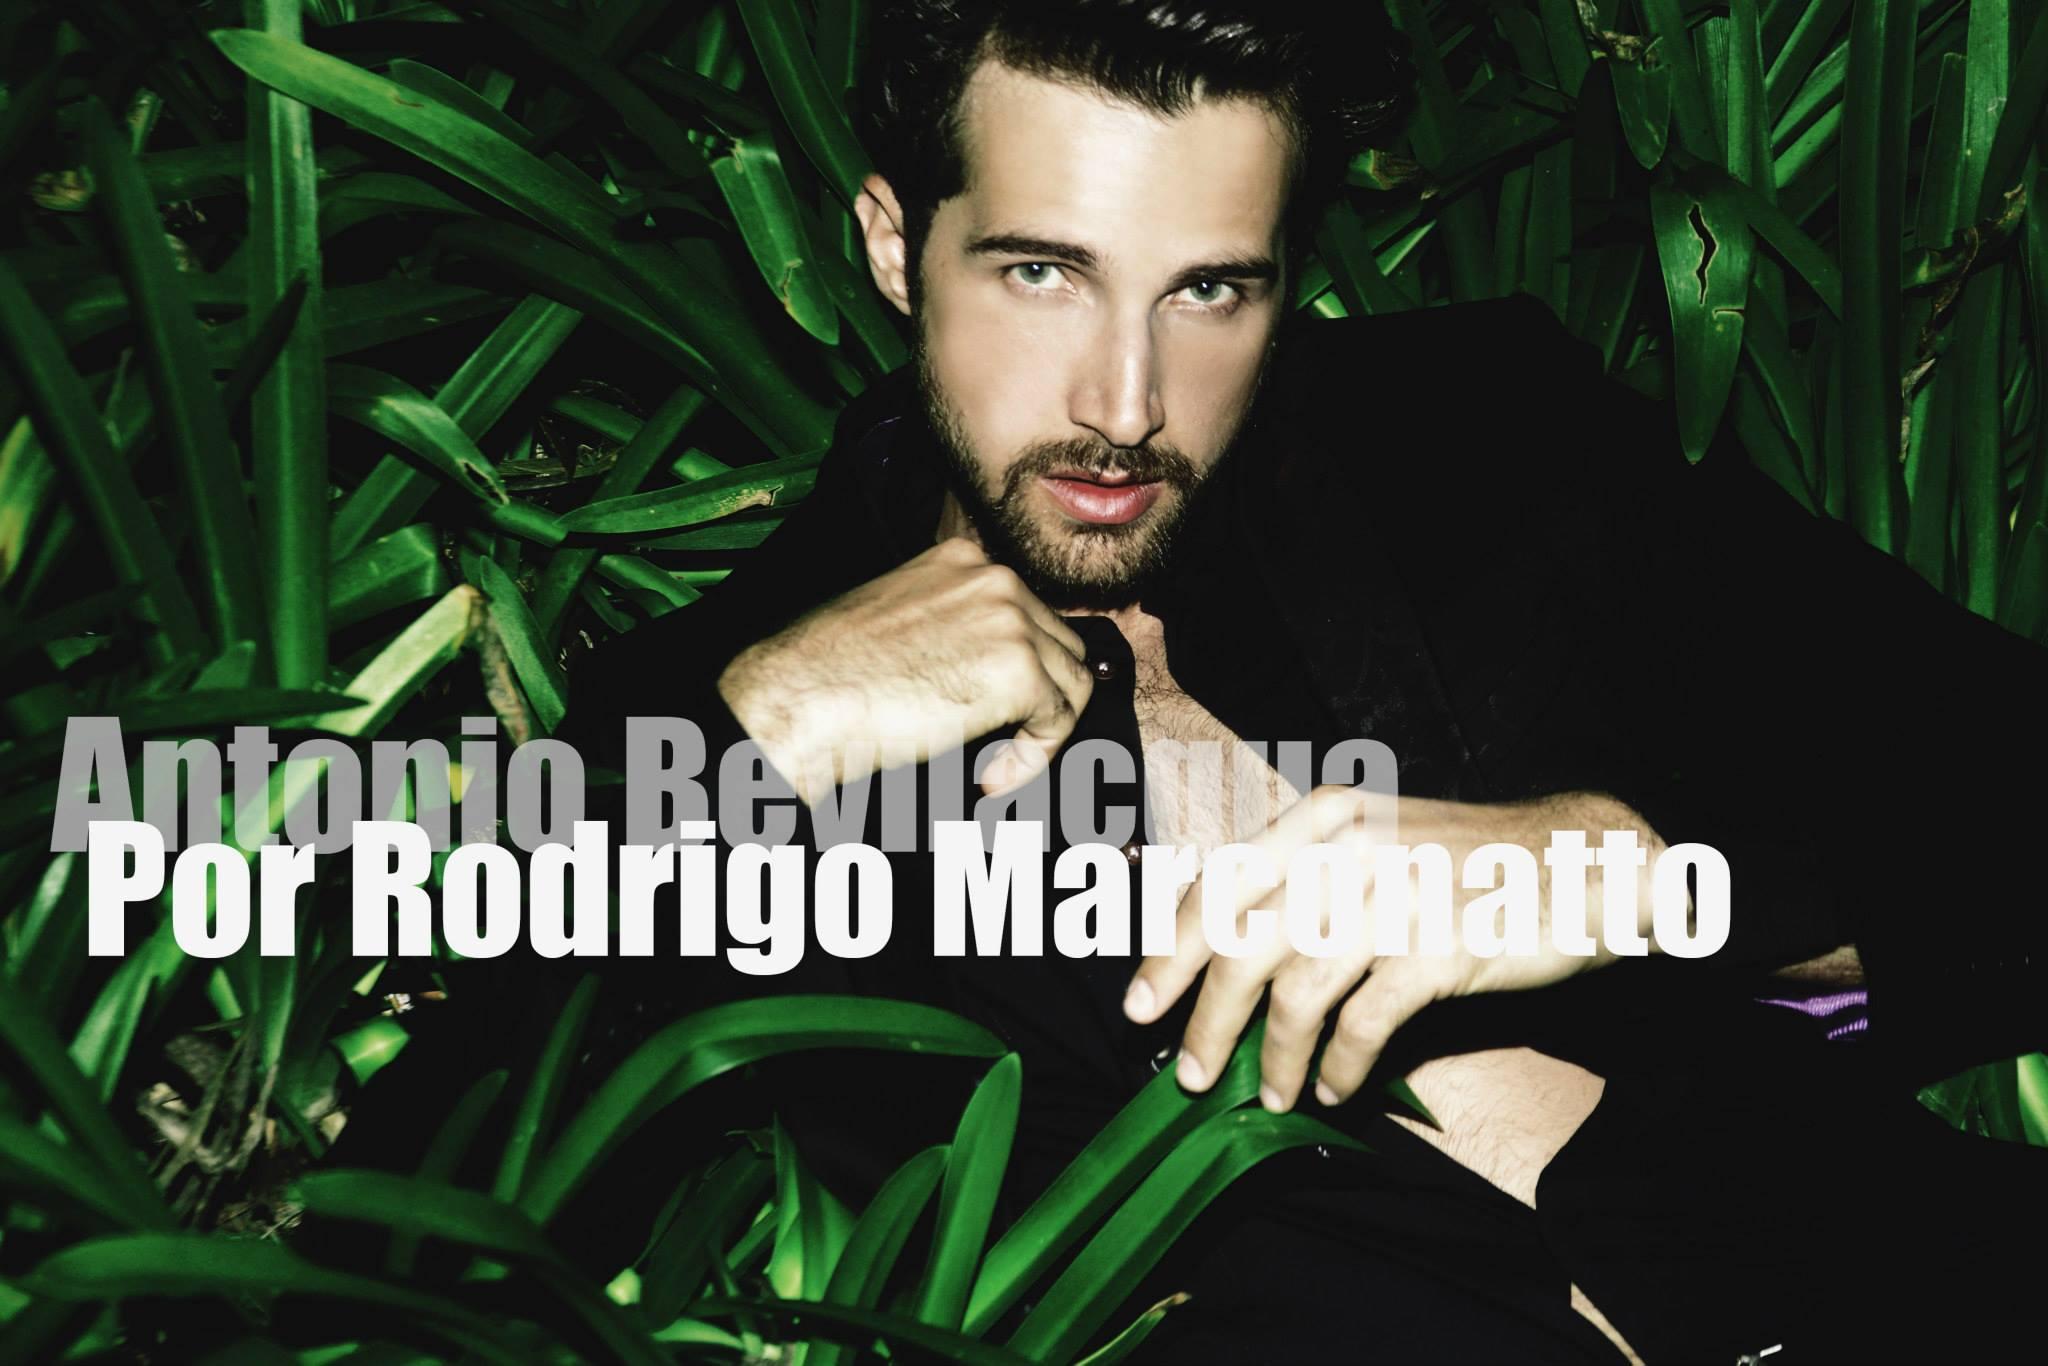 blog de moda masculina, moda masculina, menswear, estilo, style, moda sem censura, alex cursino, rodrigo marconatto, Antonio Bevilacqua, editorial de moda, modelo, way model, 2